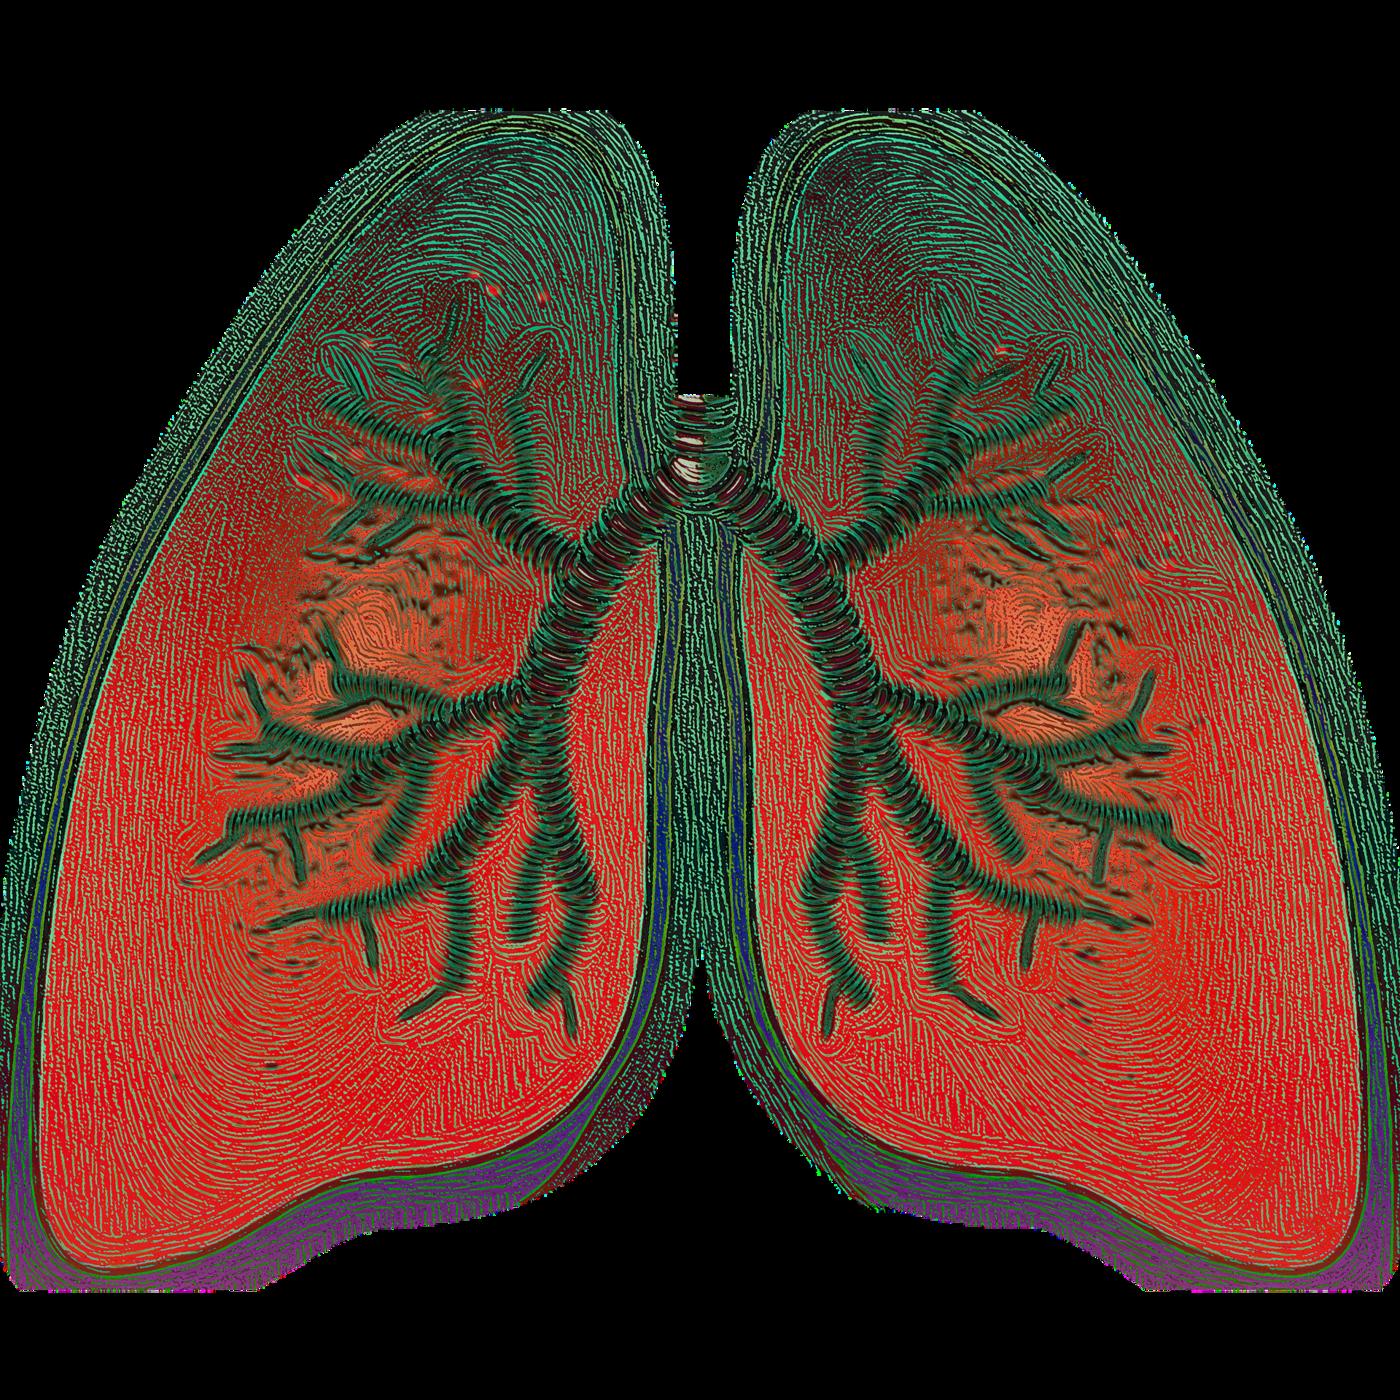 Cukier, choroby płuc, makrofagi, makrofagi Cukier, płuca Cukier, choroby płuc Cukier